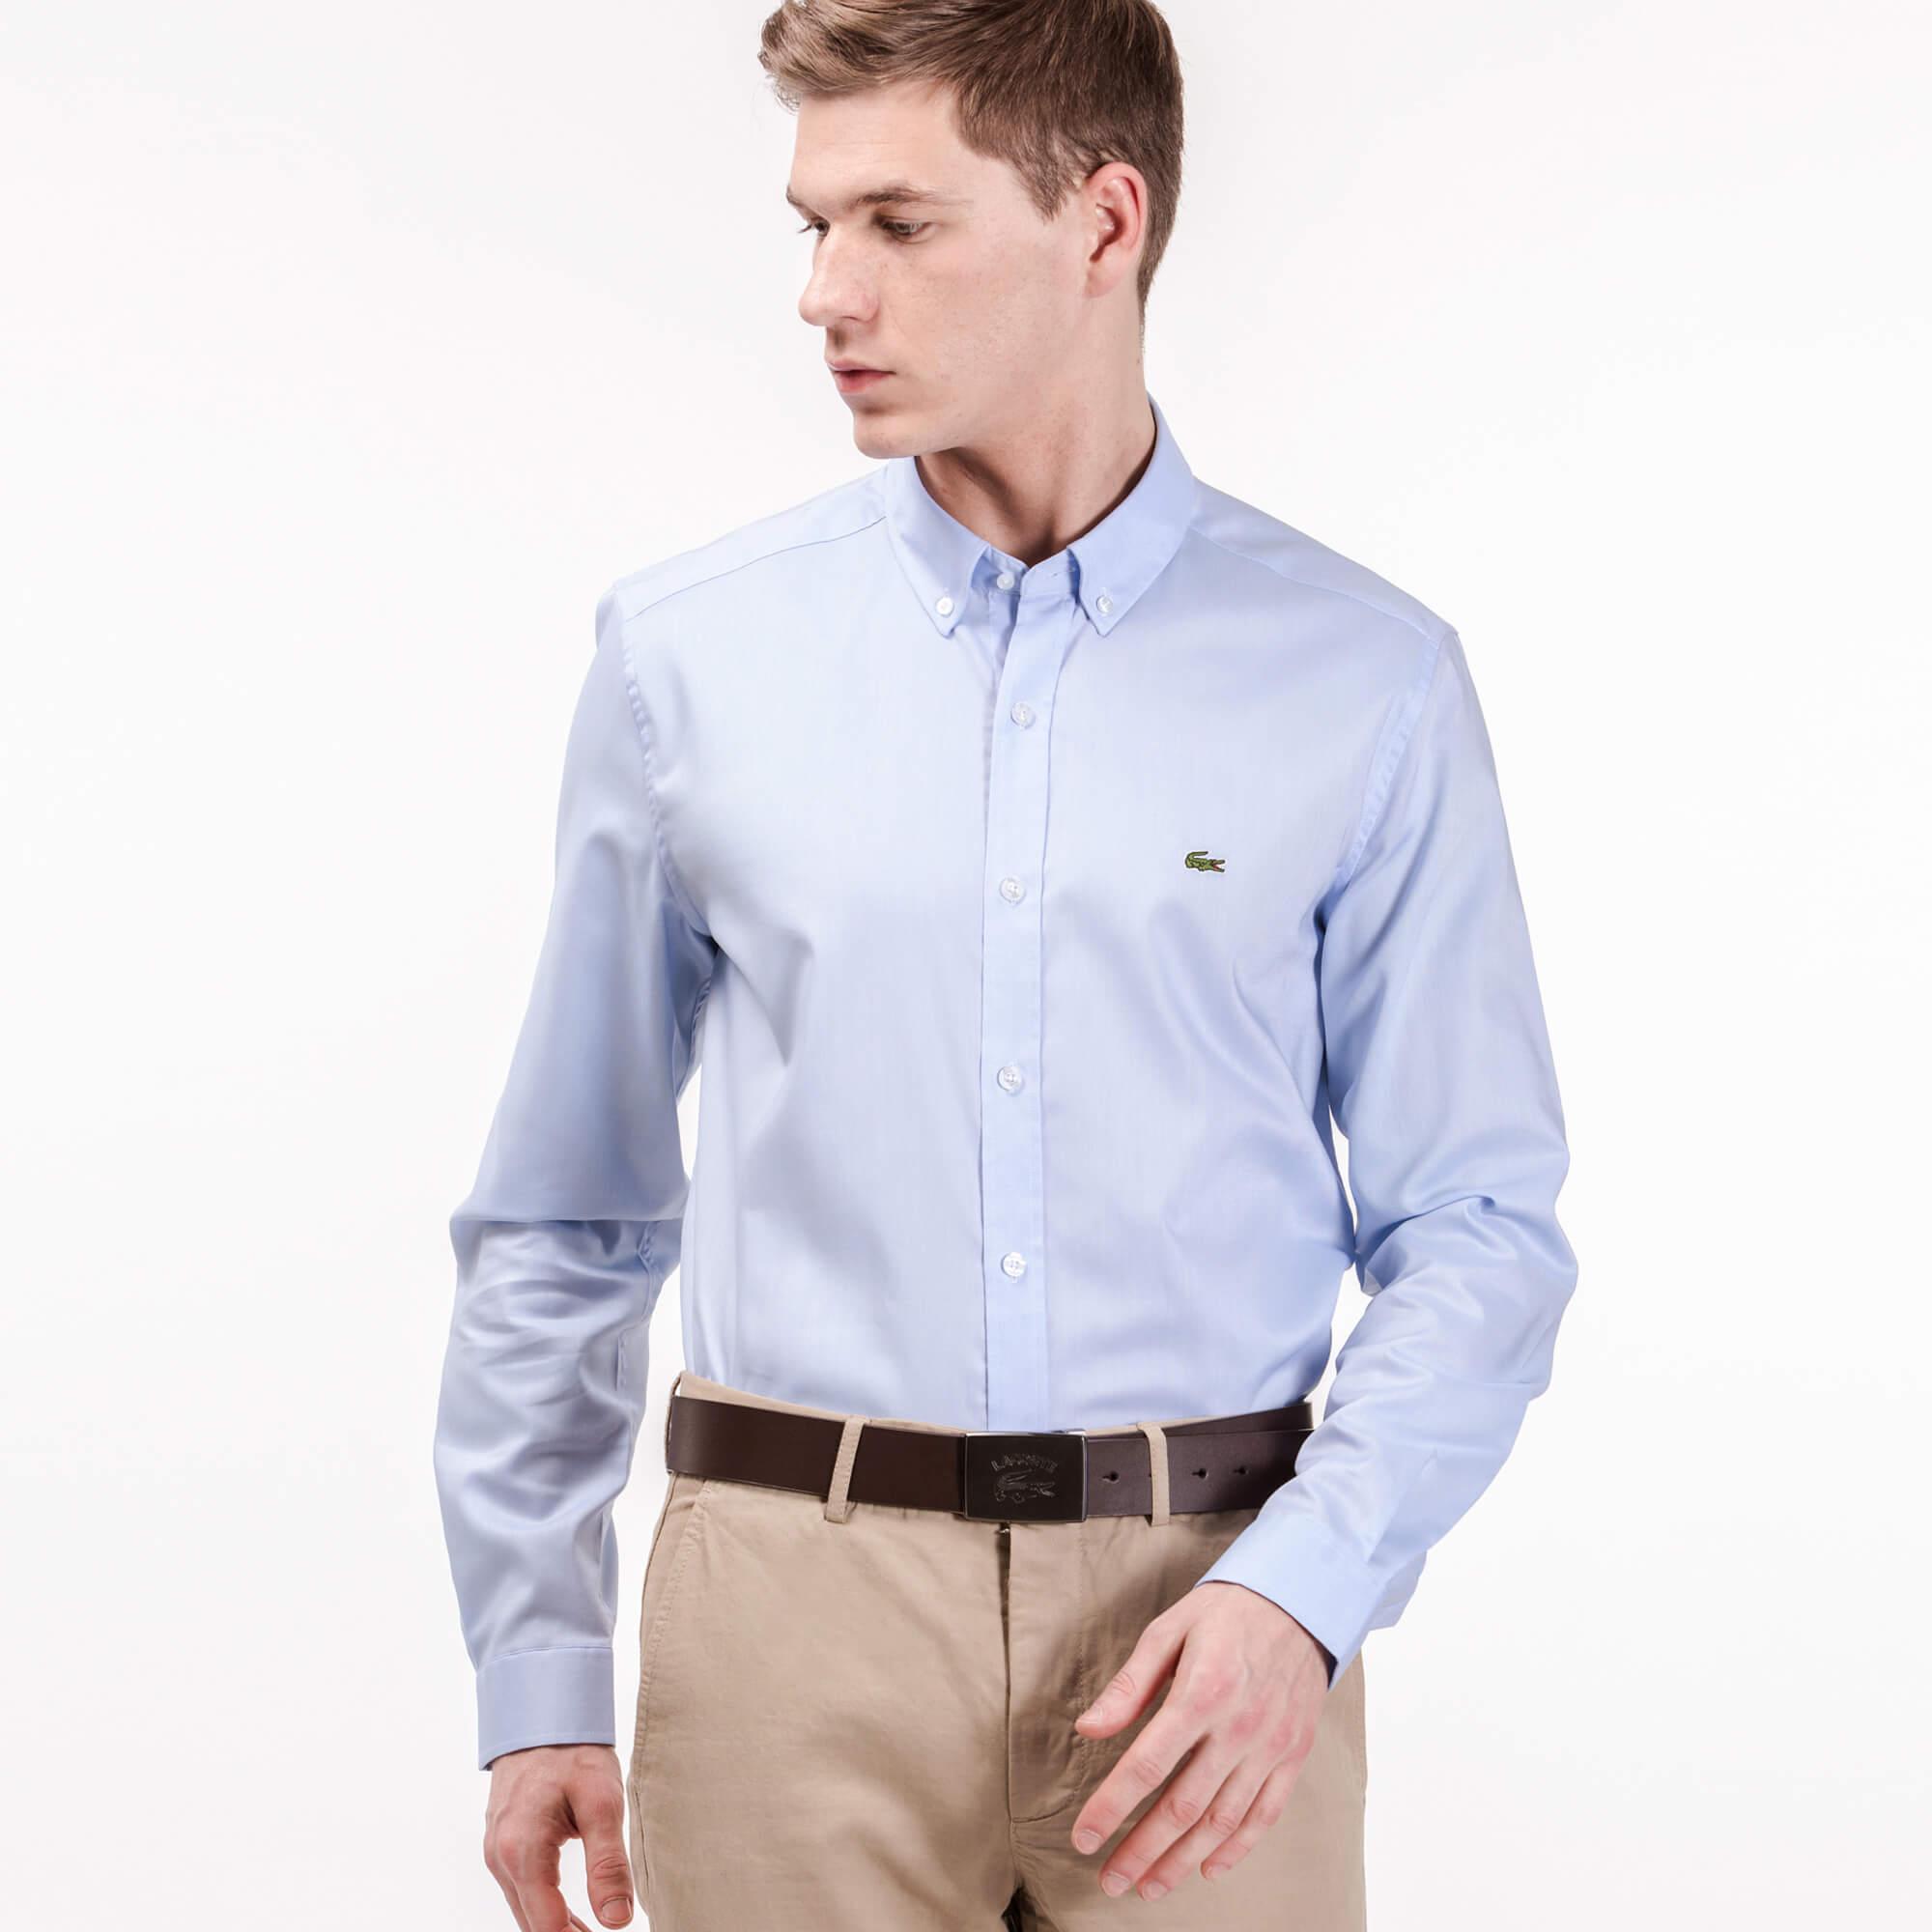 Lacoste Erkek Slim Fit Oxford Mavi Gömlek